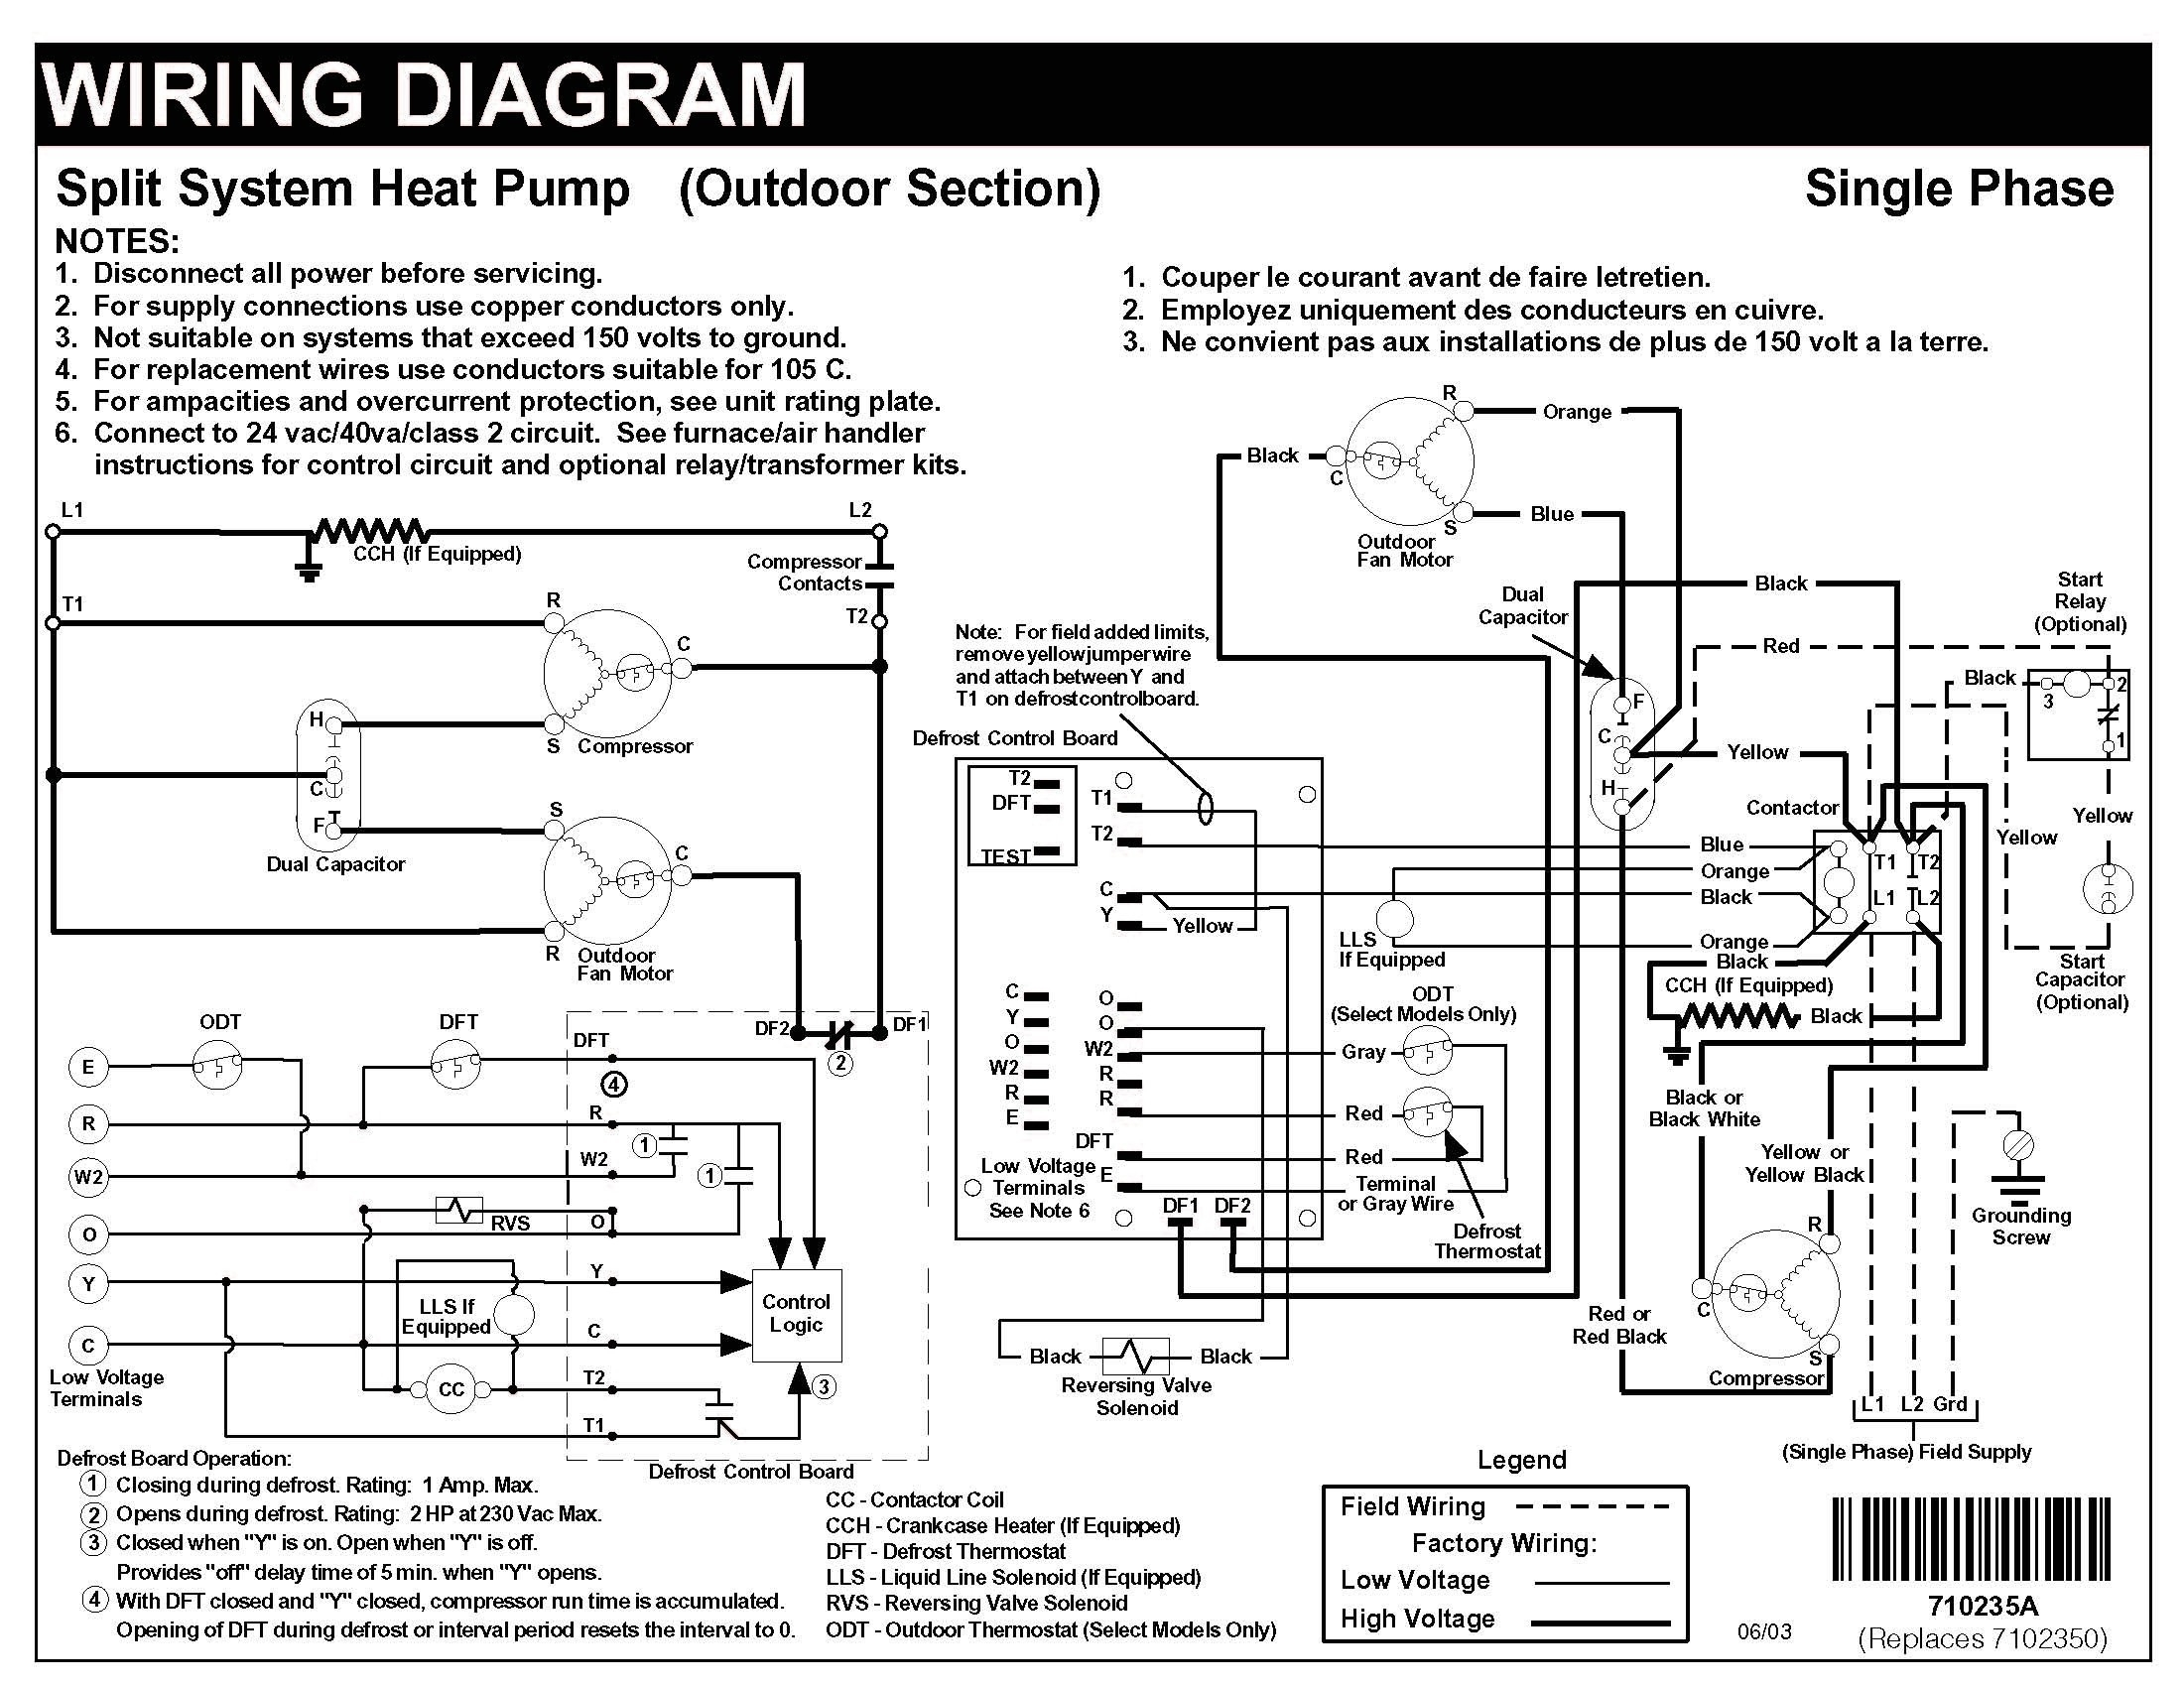 Heil Air Handler Wiring Diagram - Wiring Diagramsdare.bus.lesvignoblesguimberteau.fr